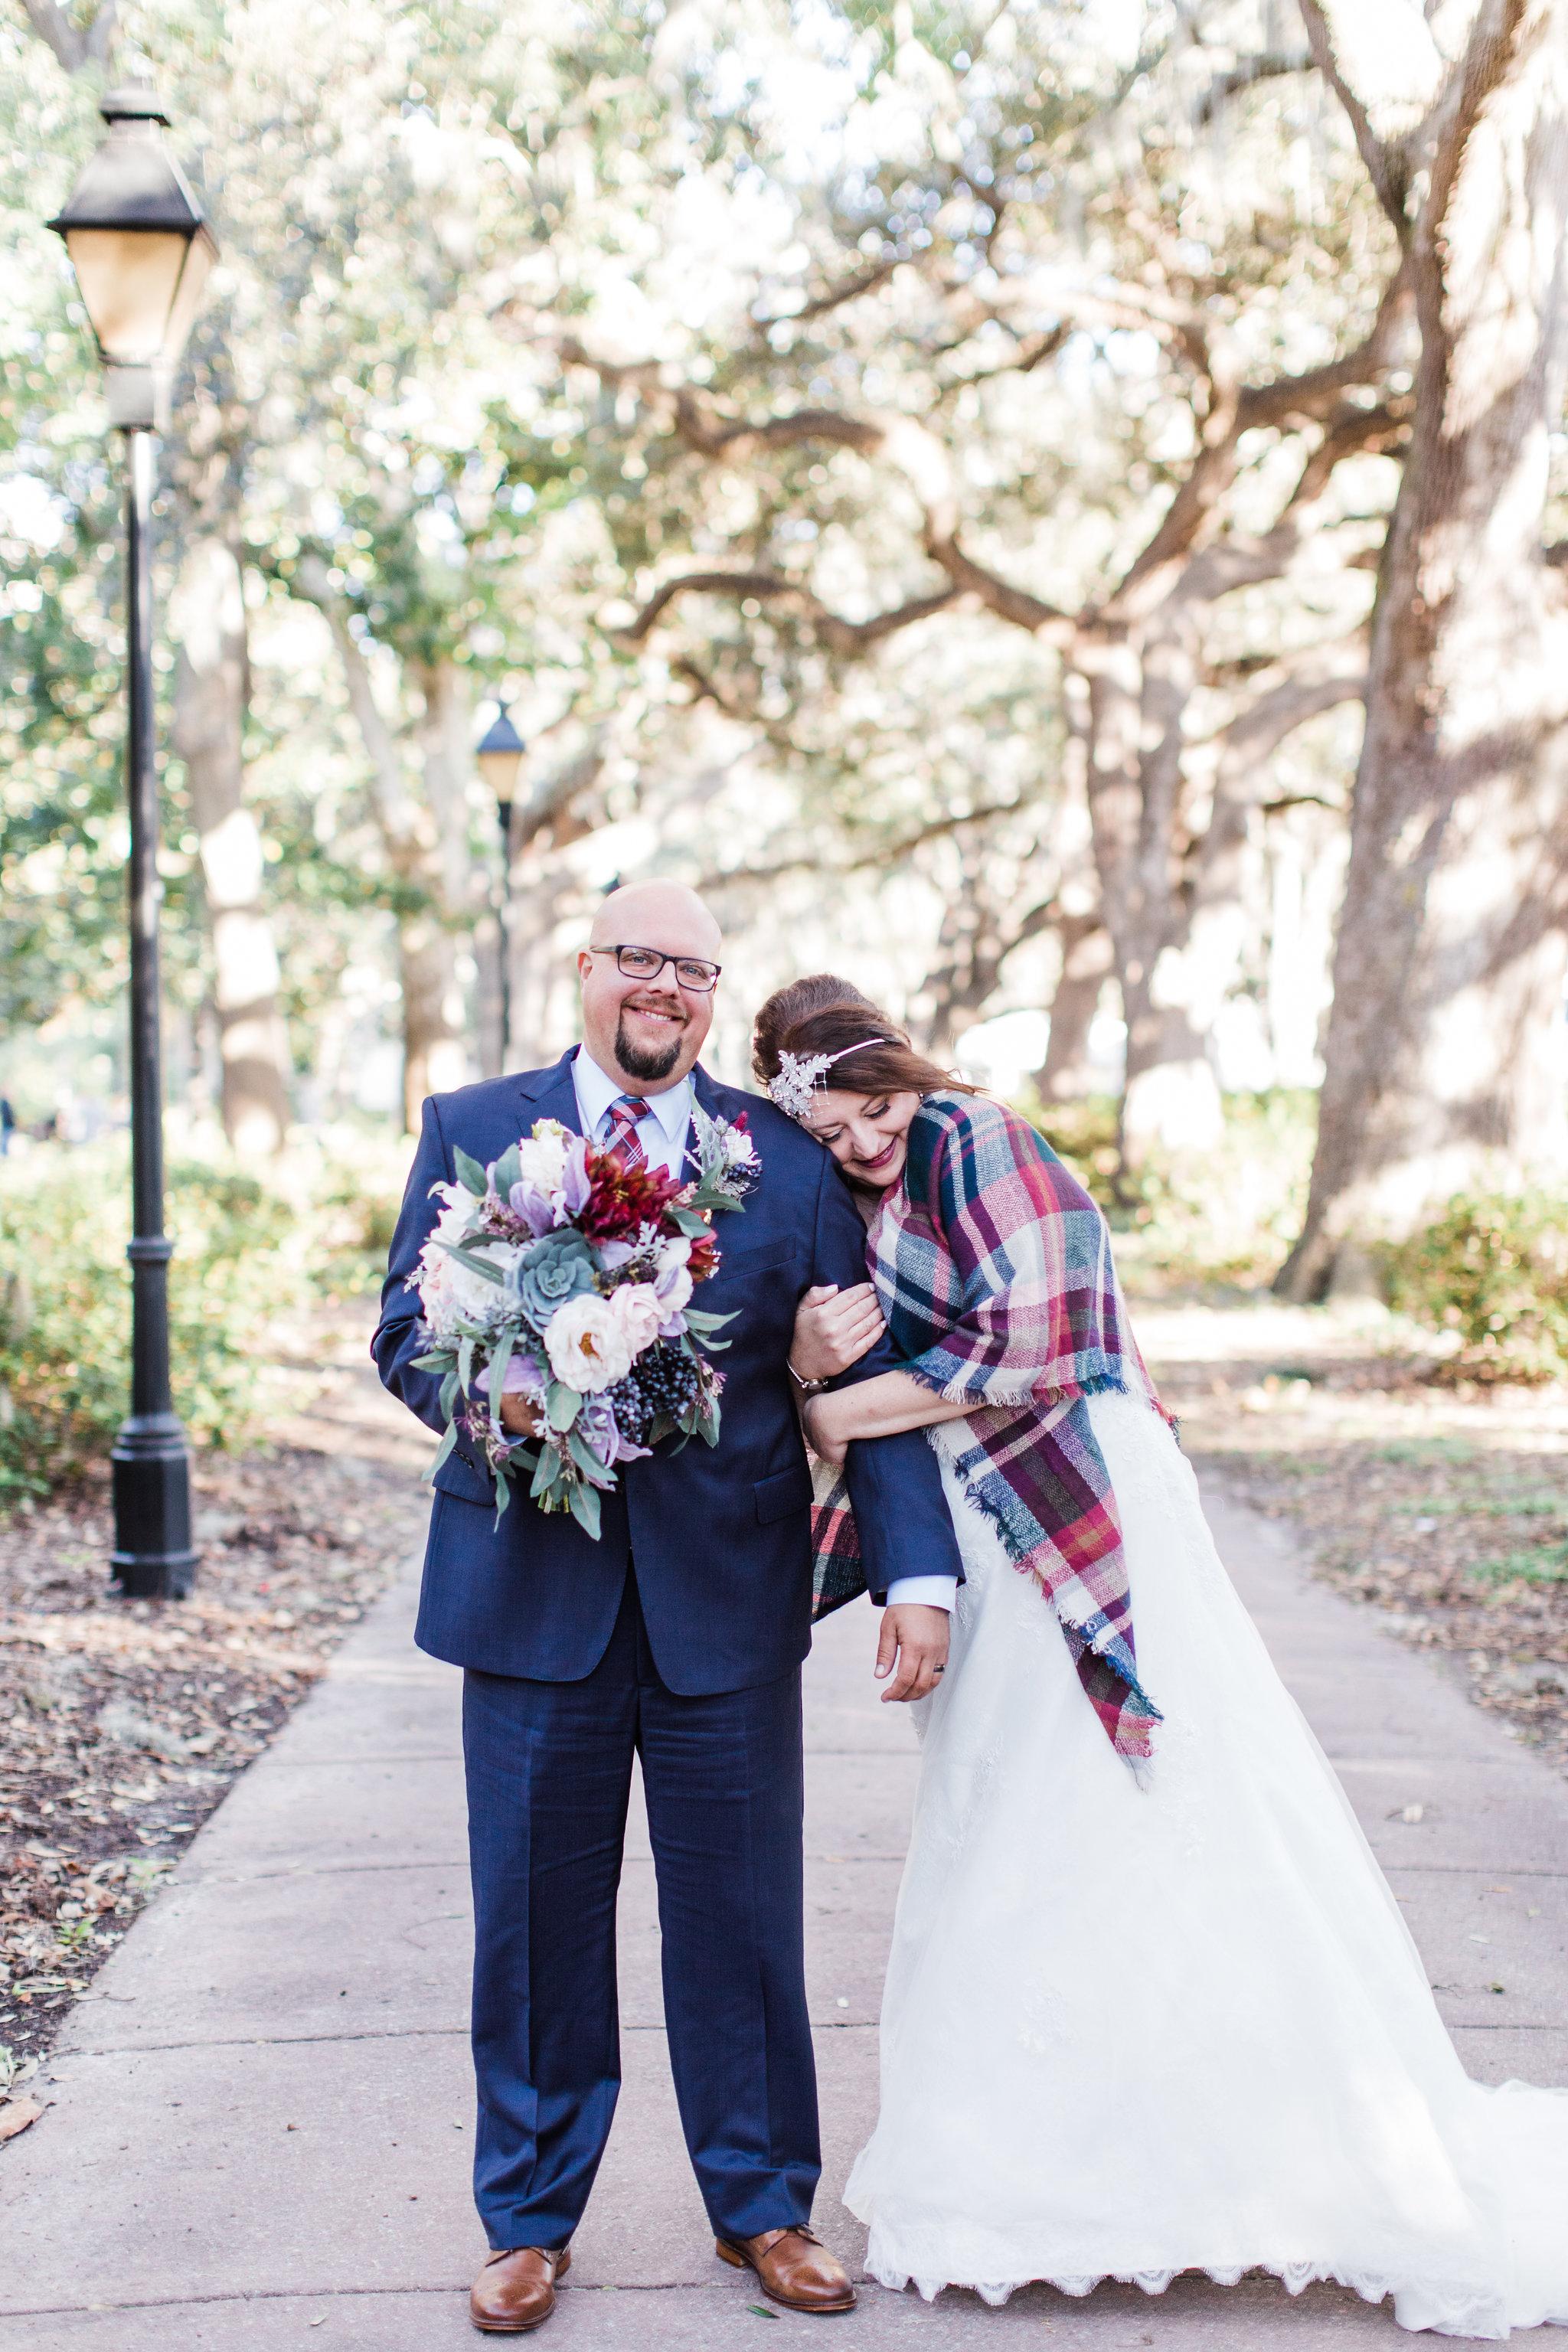 apt-b-photography-kristy-rob-wormsloe-elopment-savannah-wedding-photographer-savannah-elopement-wormsloe-wedding-historic-savannah-elopement-photographer-savannah-fall-wedding-34.jpg